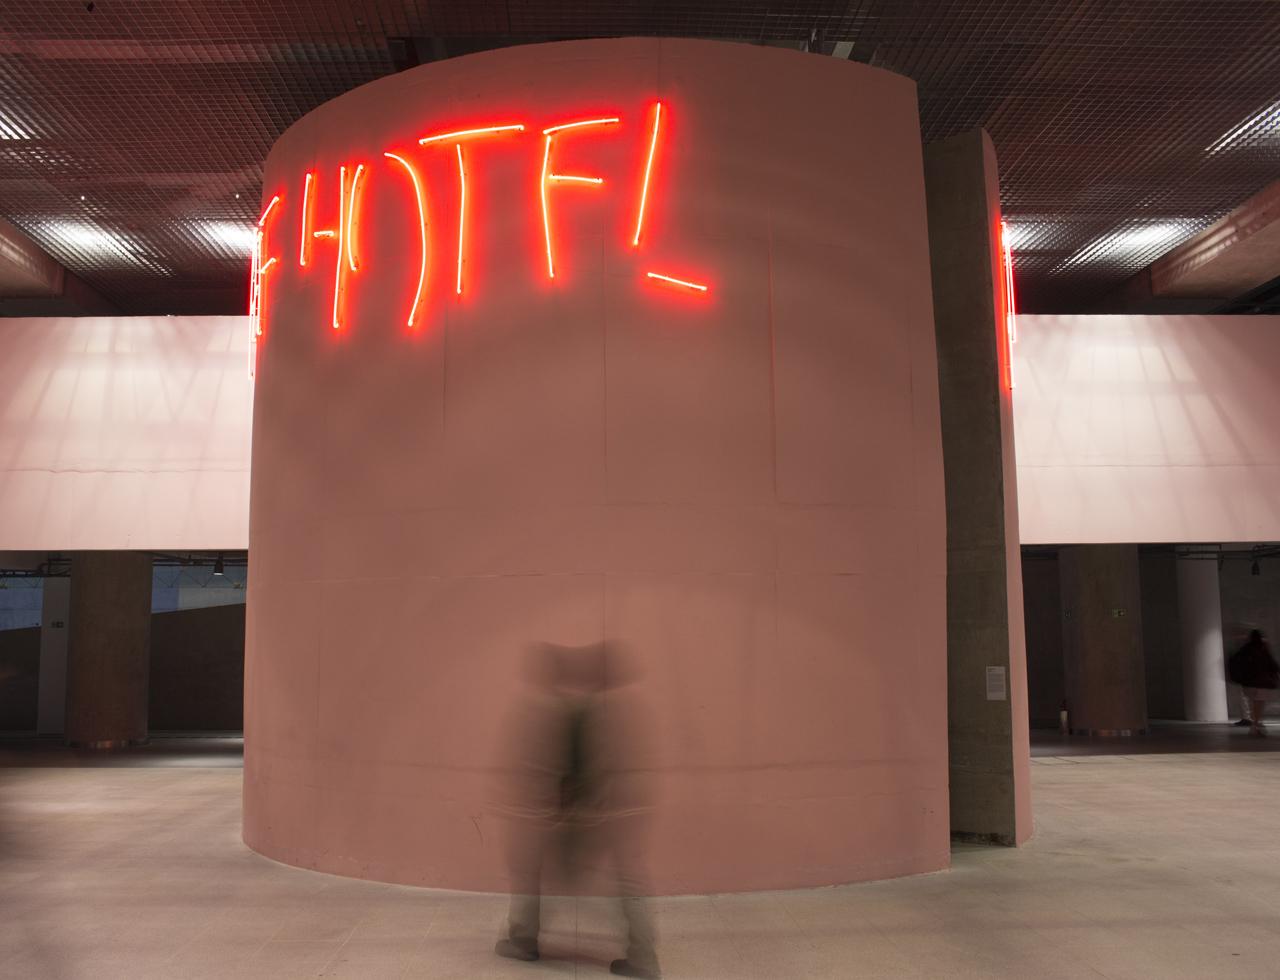 Grande_Hotel_MG_1882_ok_PPM